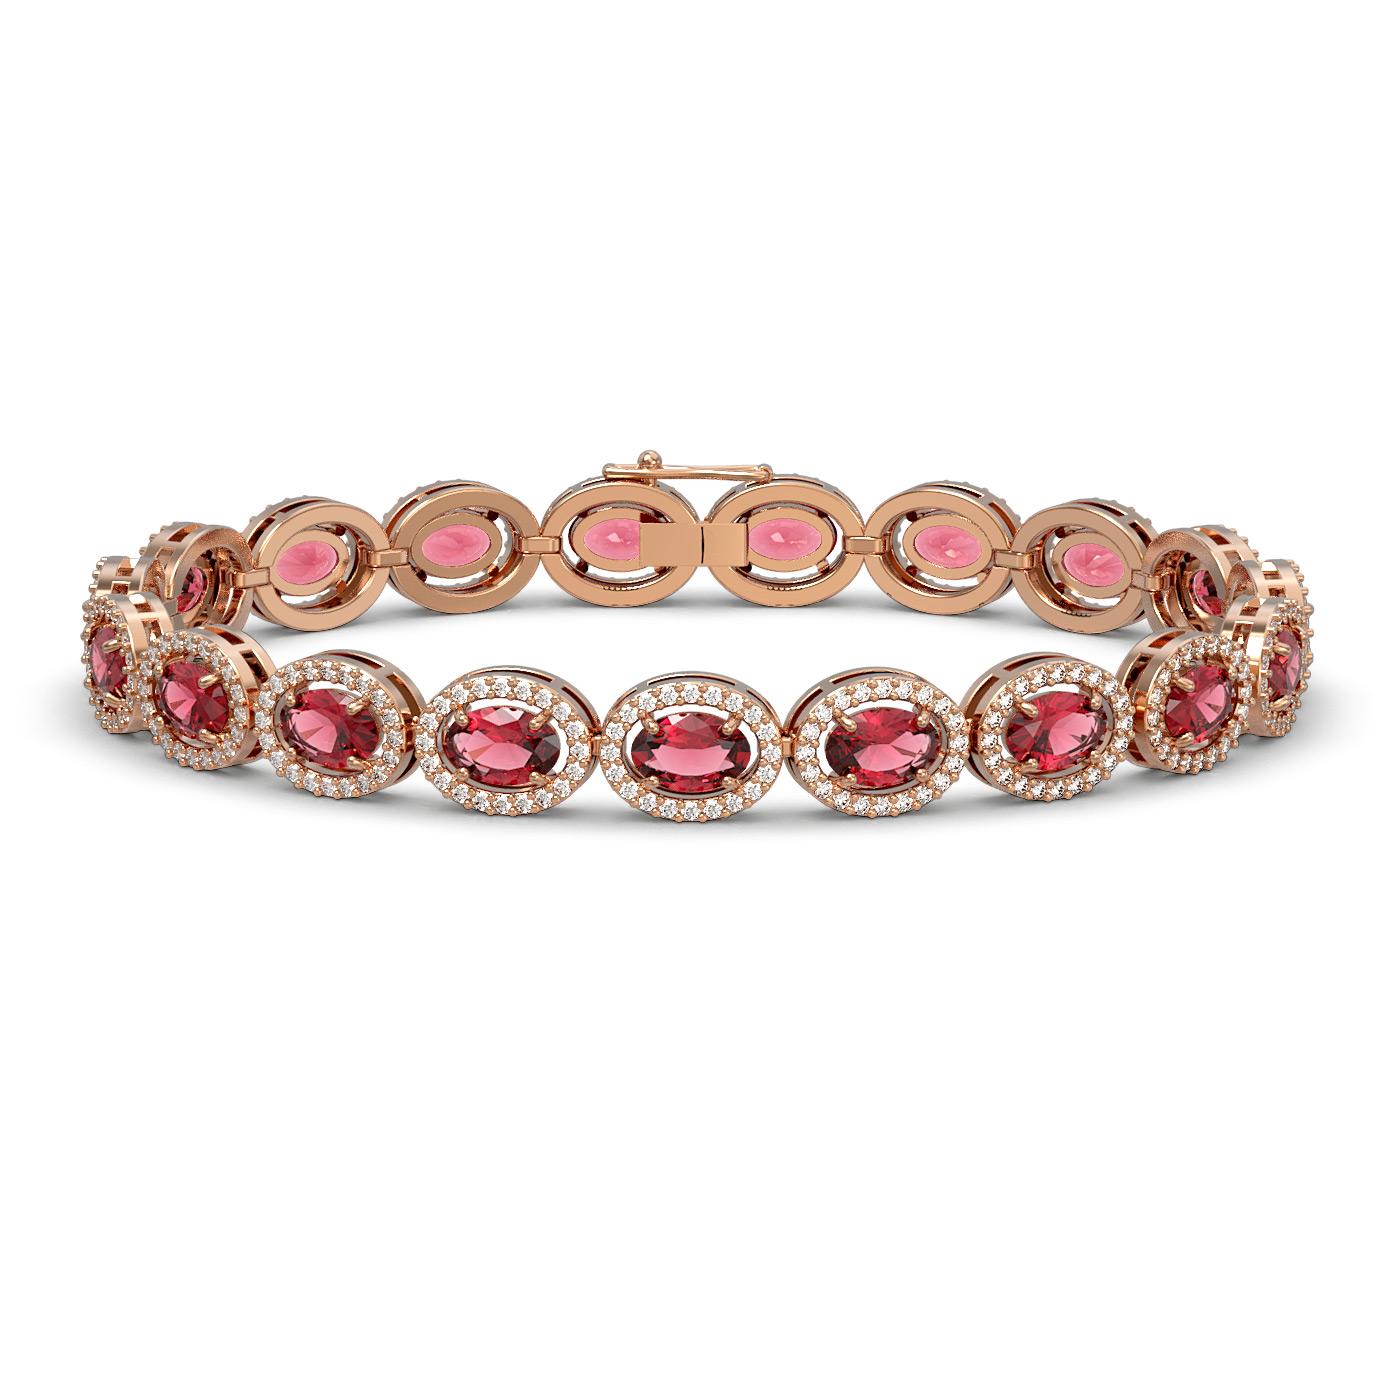 13.87 Ctw Tourmaline & Diamond Bracelet Rose Gold